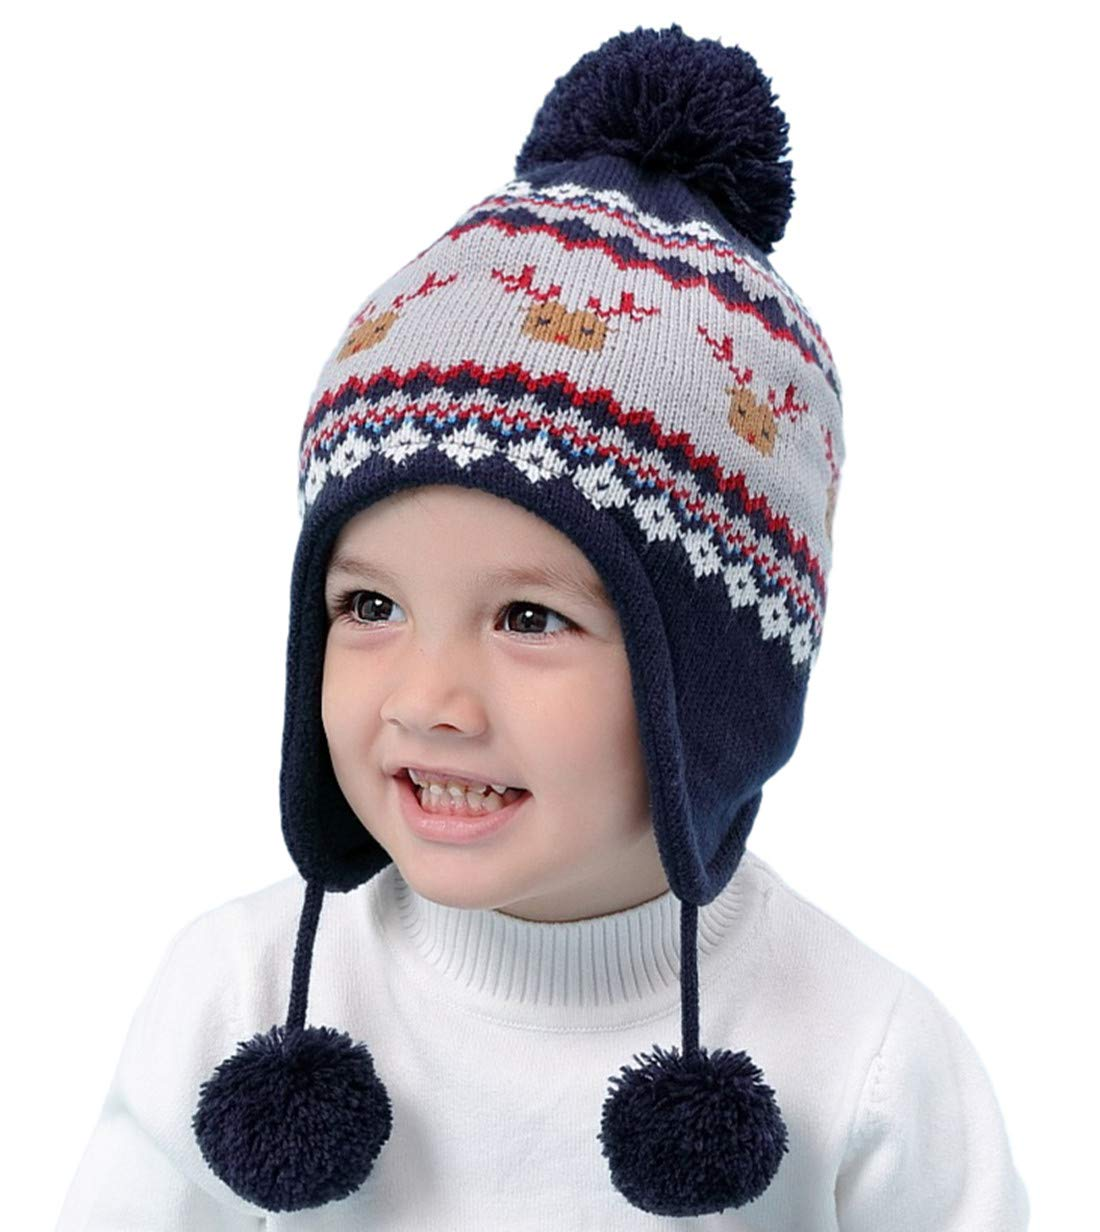 f6ae11db7fd Connectyle Toddler Infant Baby Knit Kids Hat Fleece Lined Earflap Beanie Hat  Warm Winter Skull Cap Navy